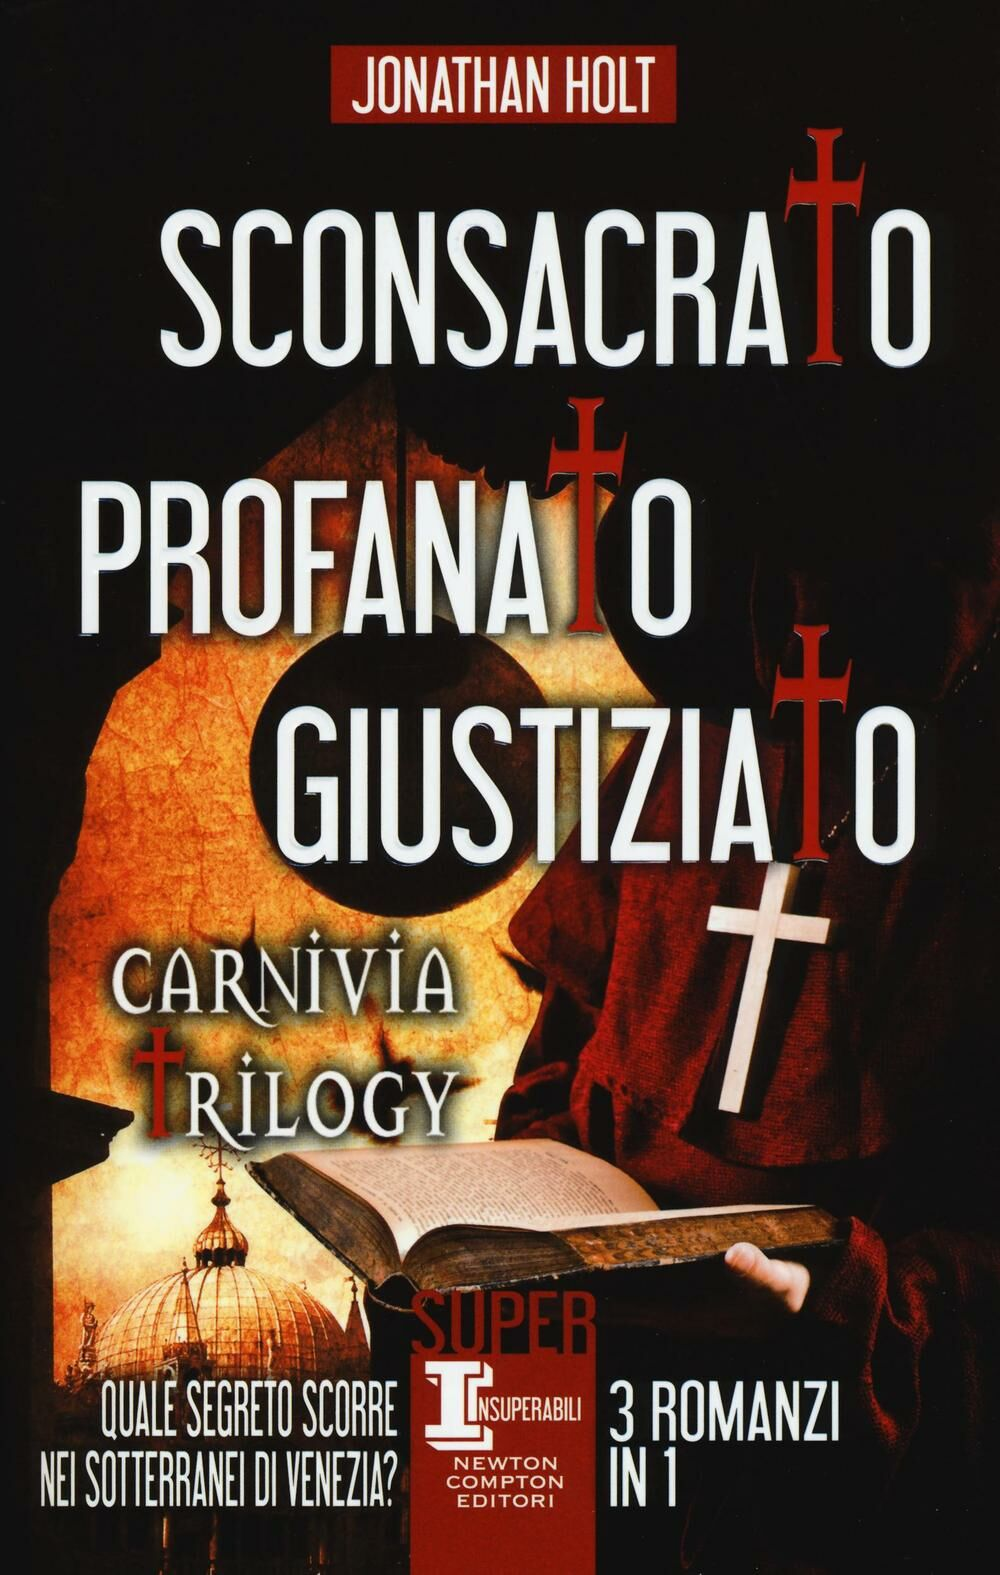 Sconsacrato-Profanato-Giustiziato. Carnivia trilogy